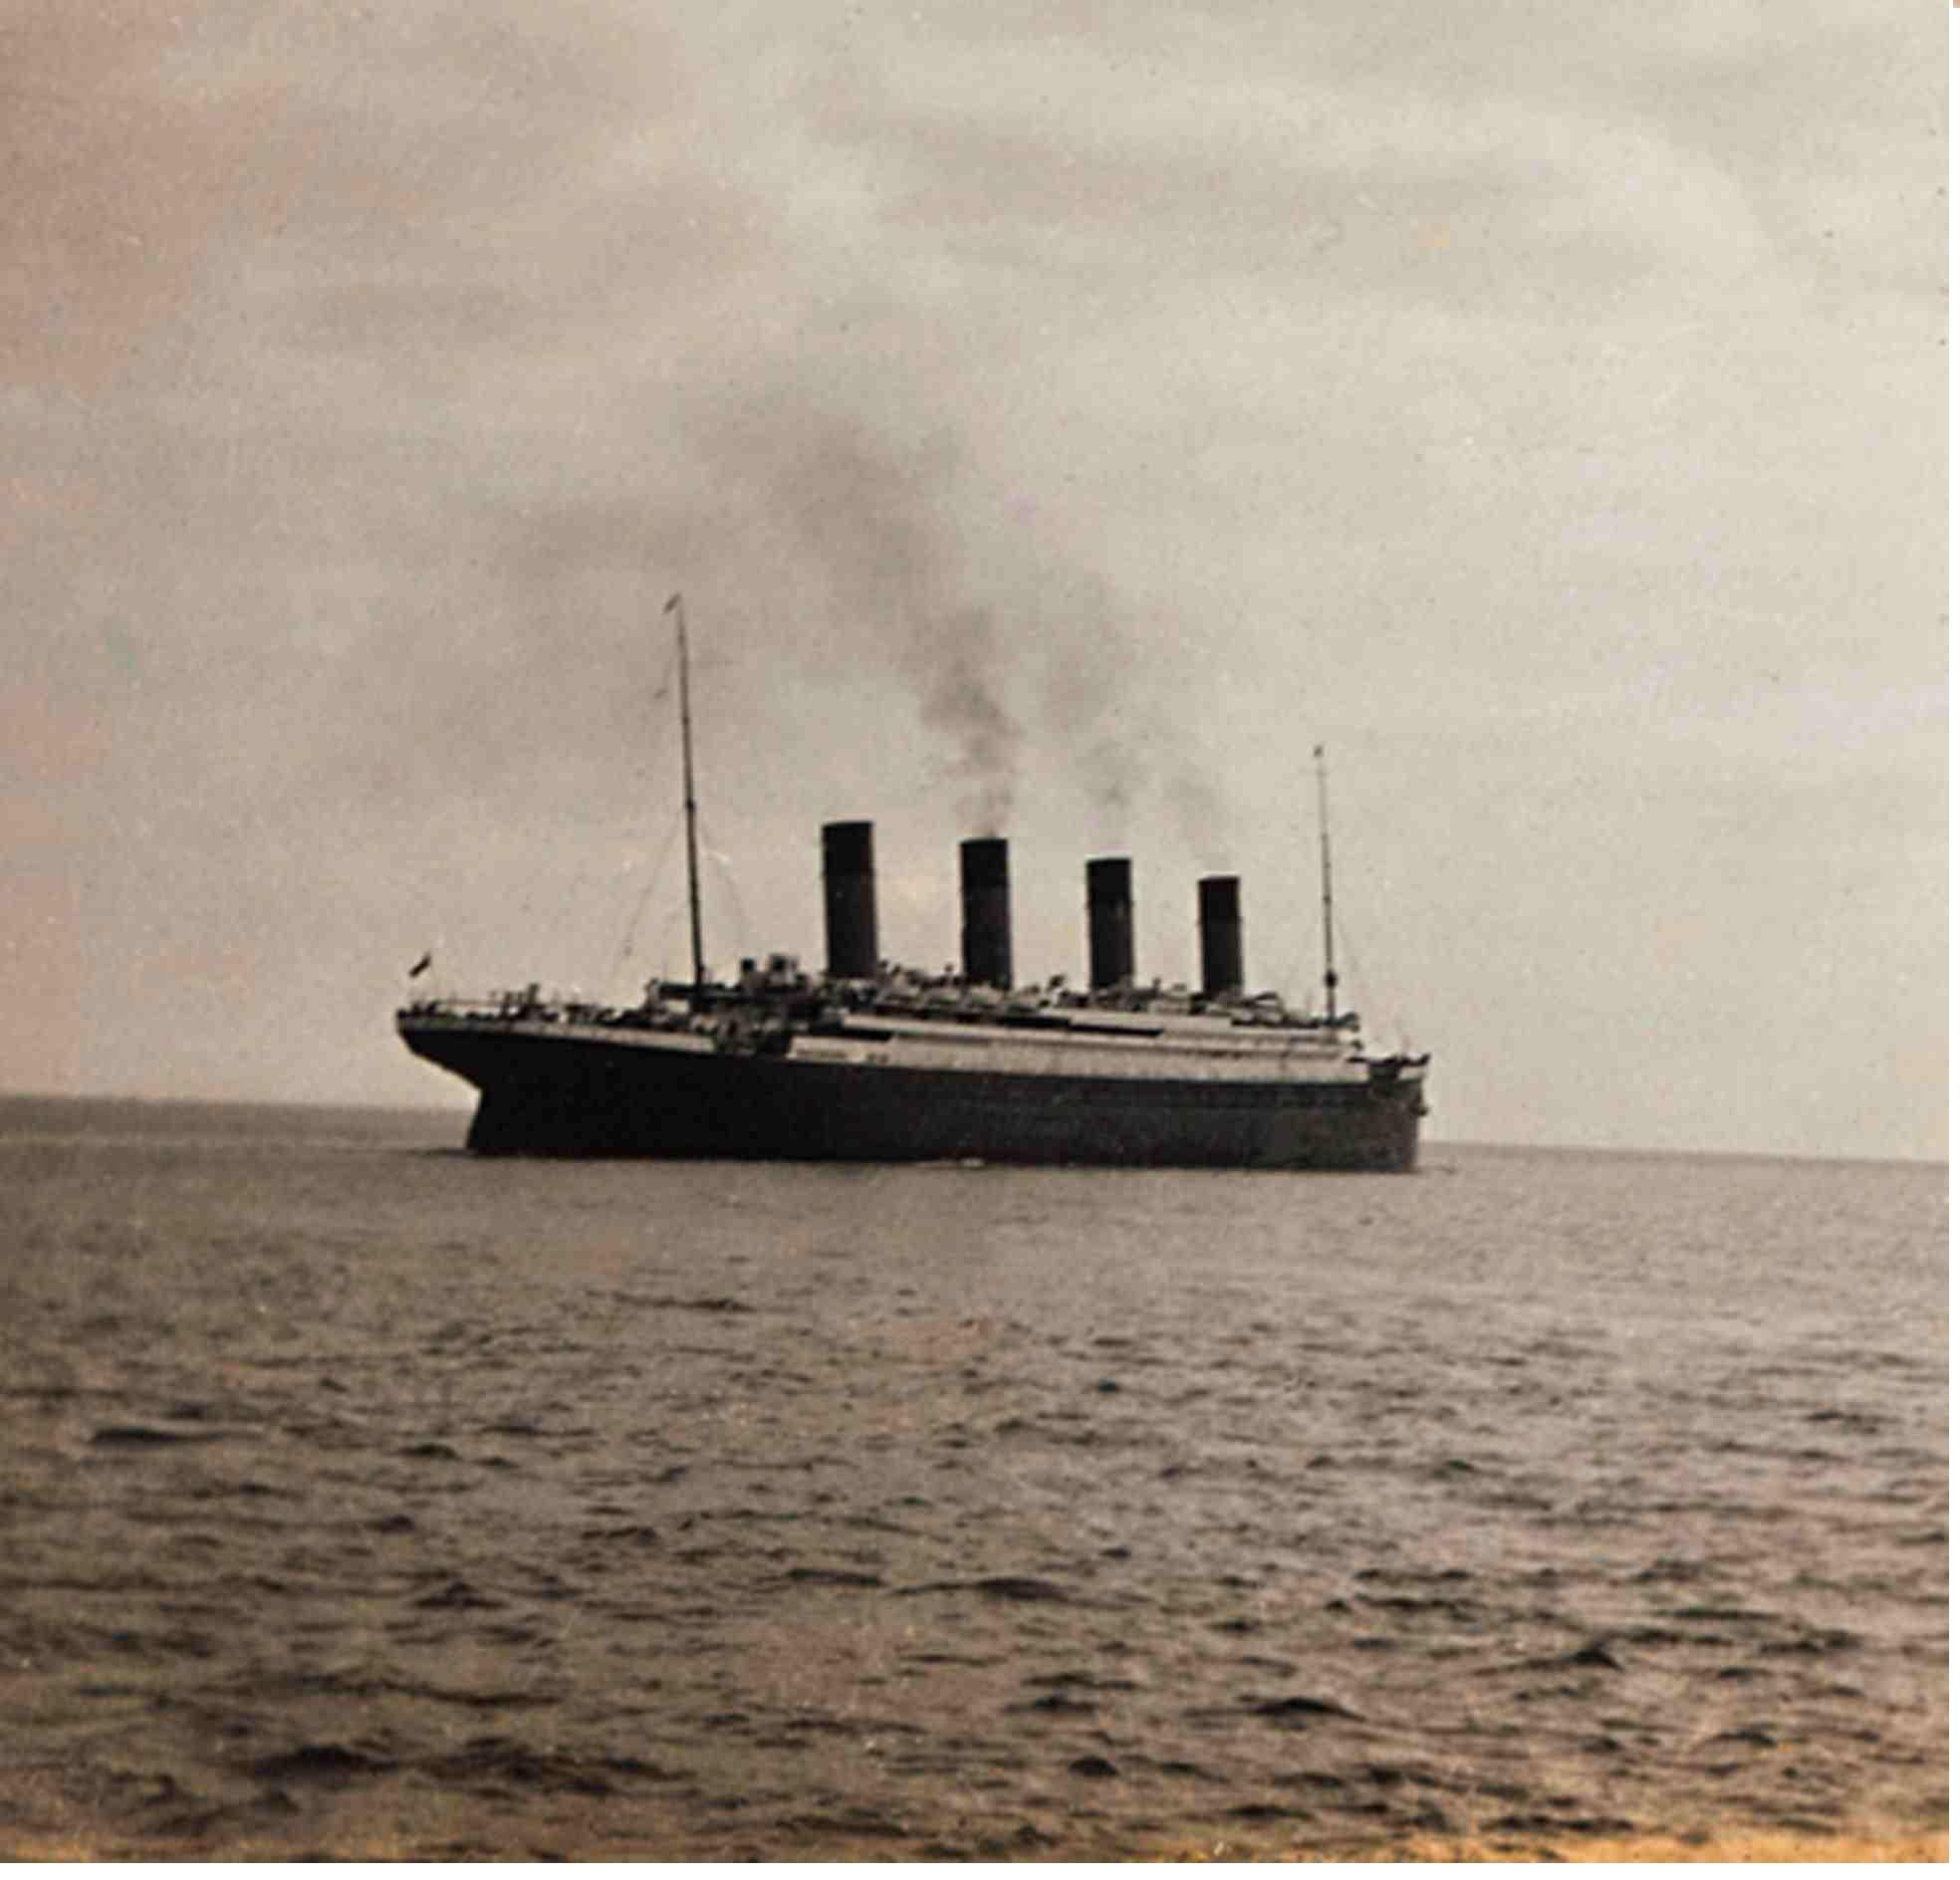 Titanic Wallpaper: RMS Titanic Wallpapers